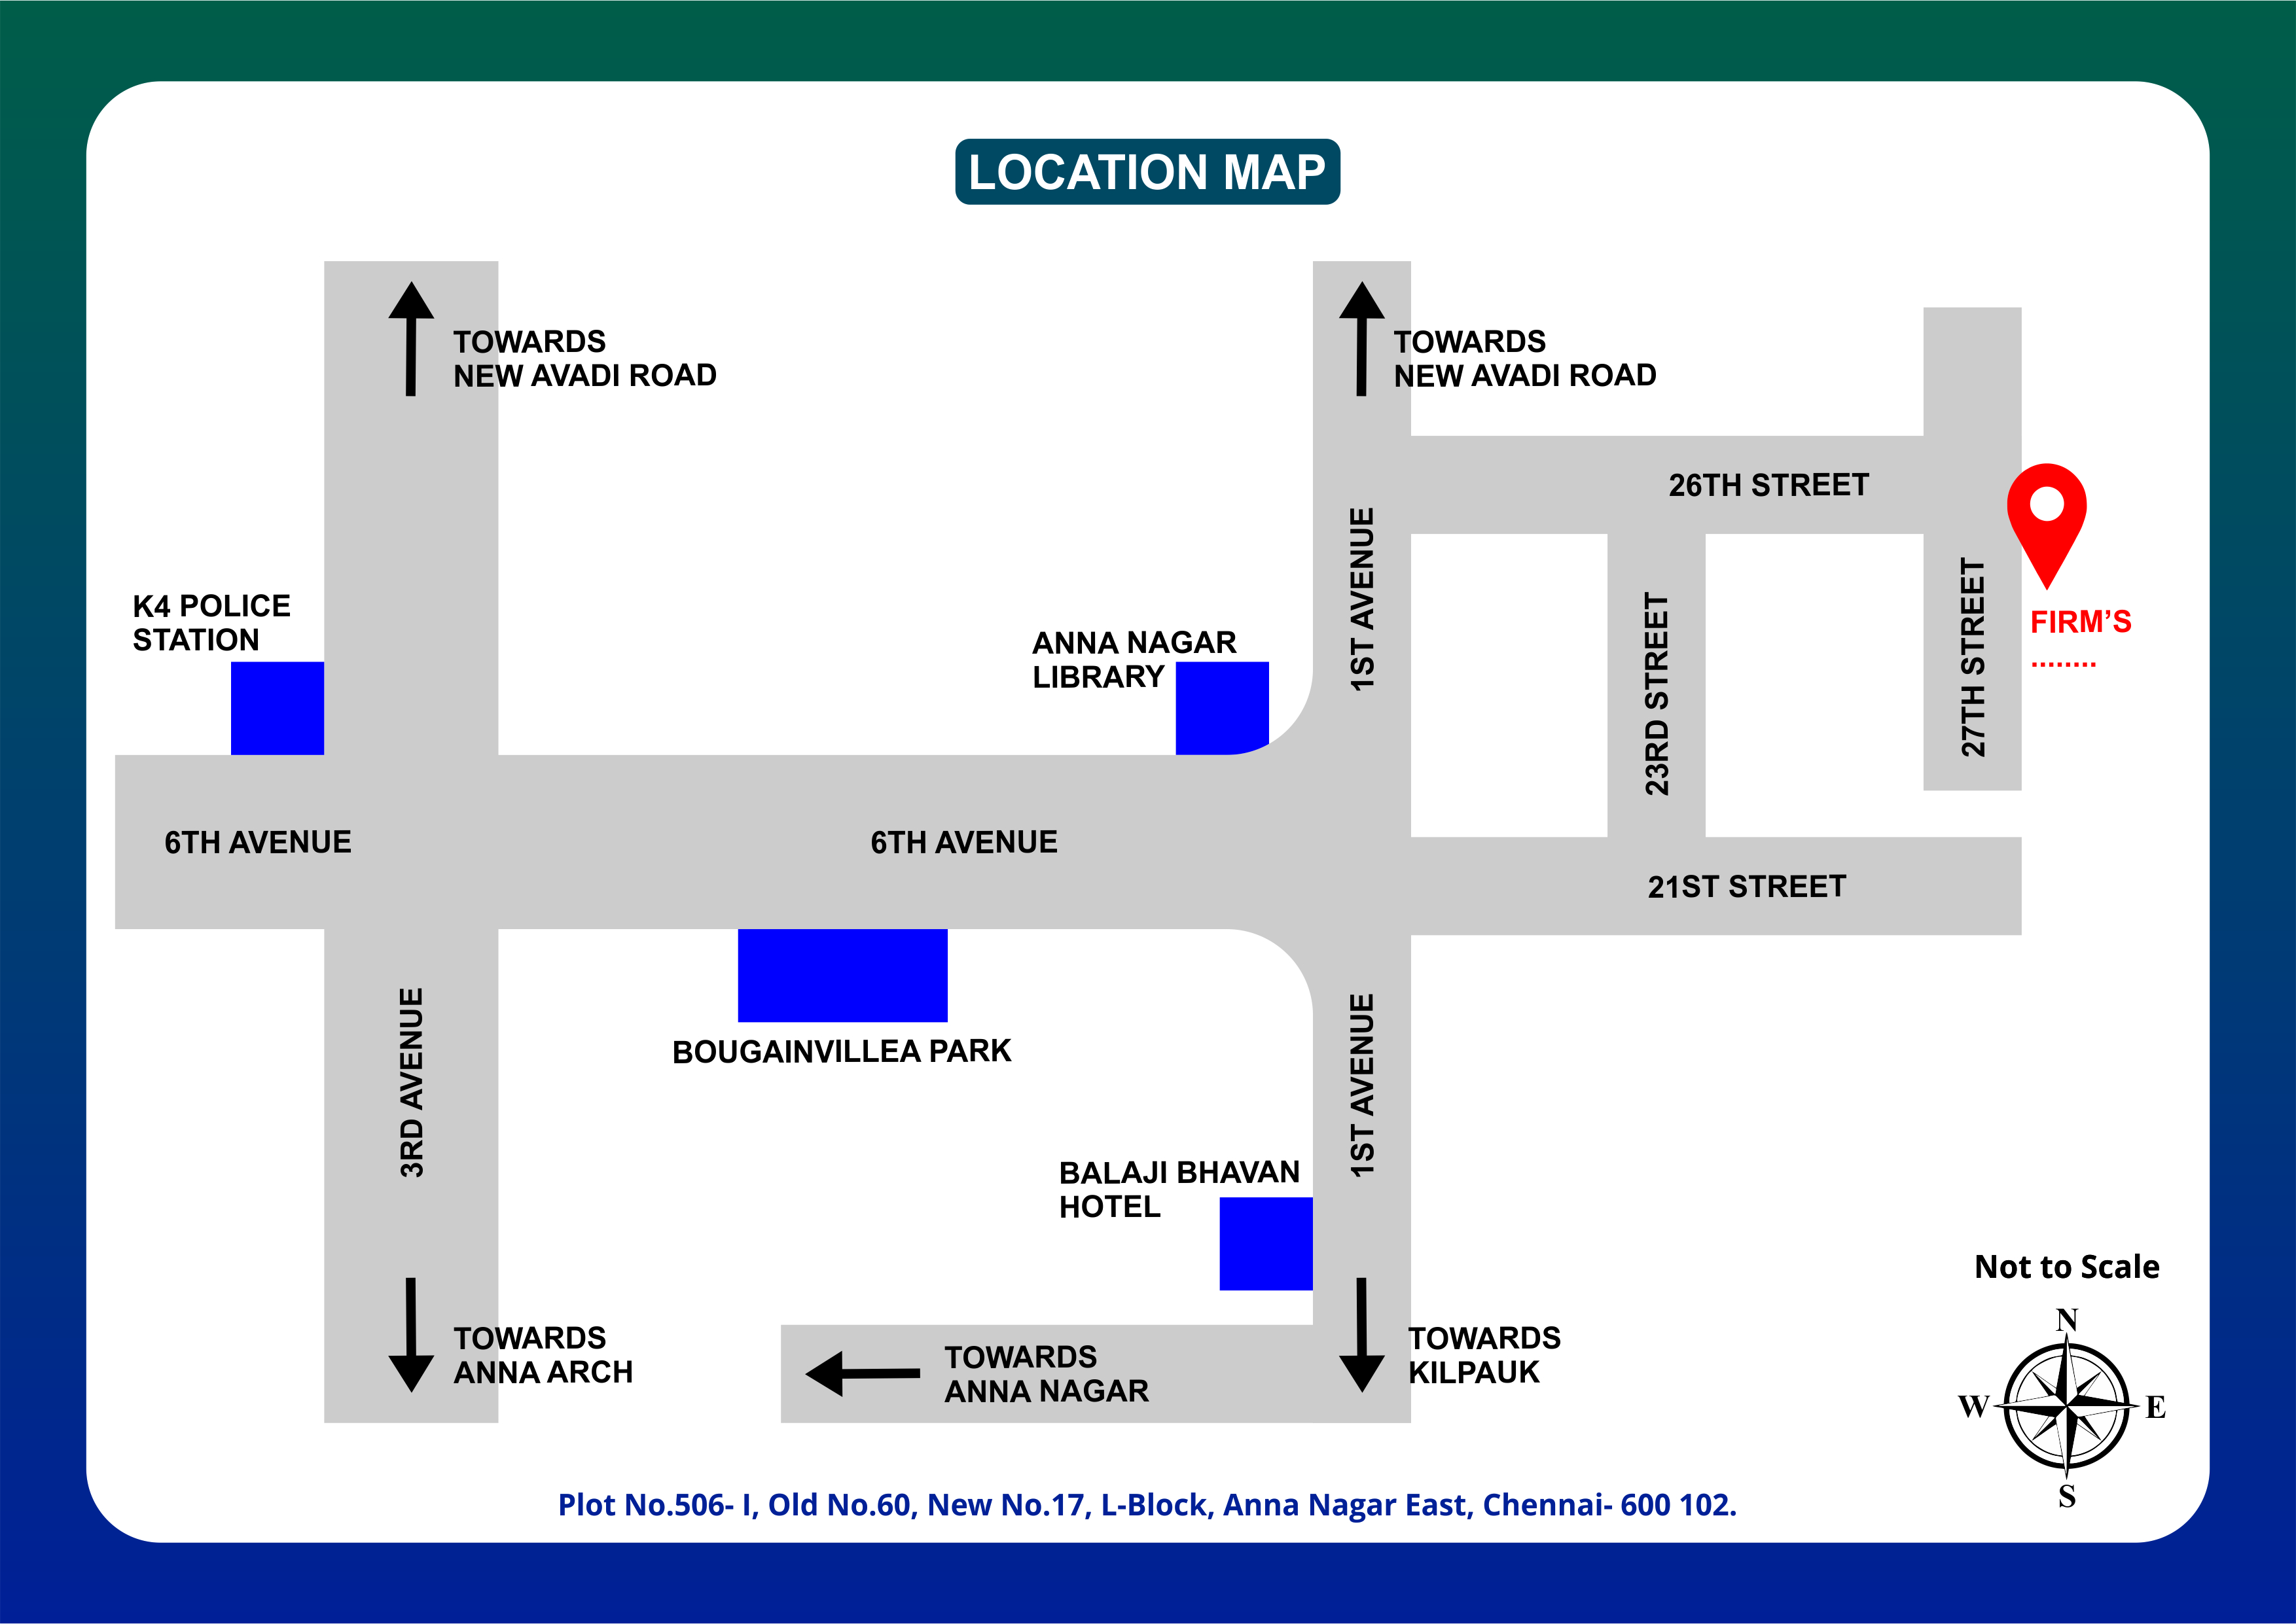 https://firmfoundations.in/projects/location/thumbnails/15699152988L_Block_Key_Plan.jpg